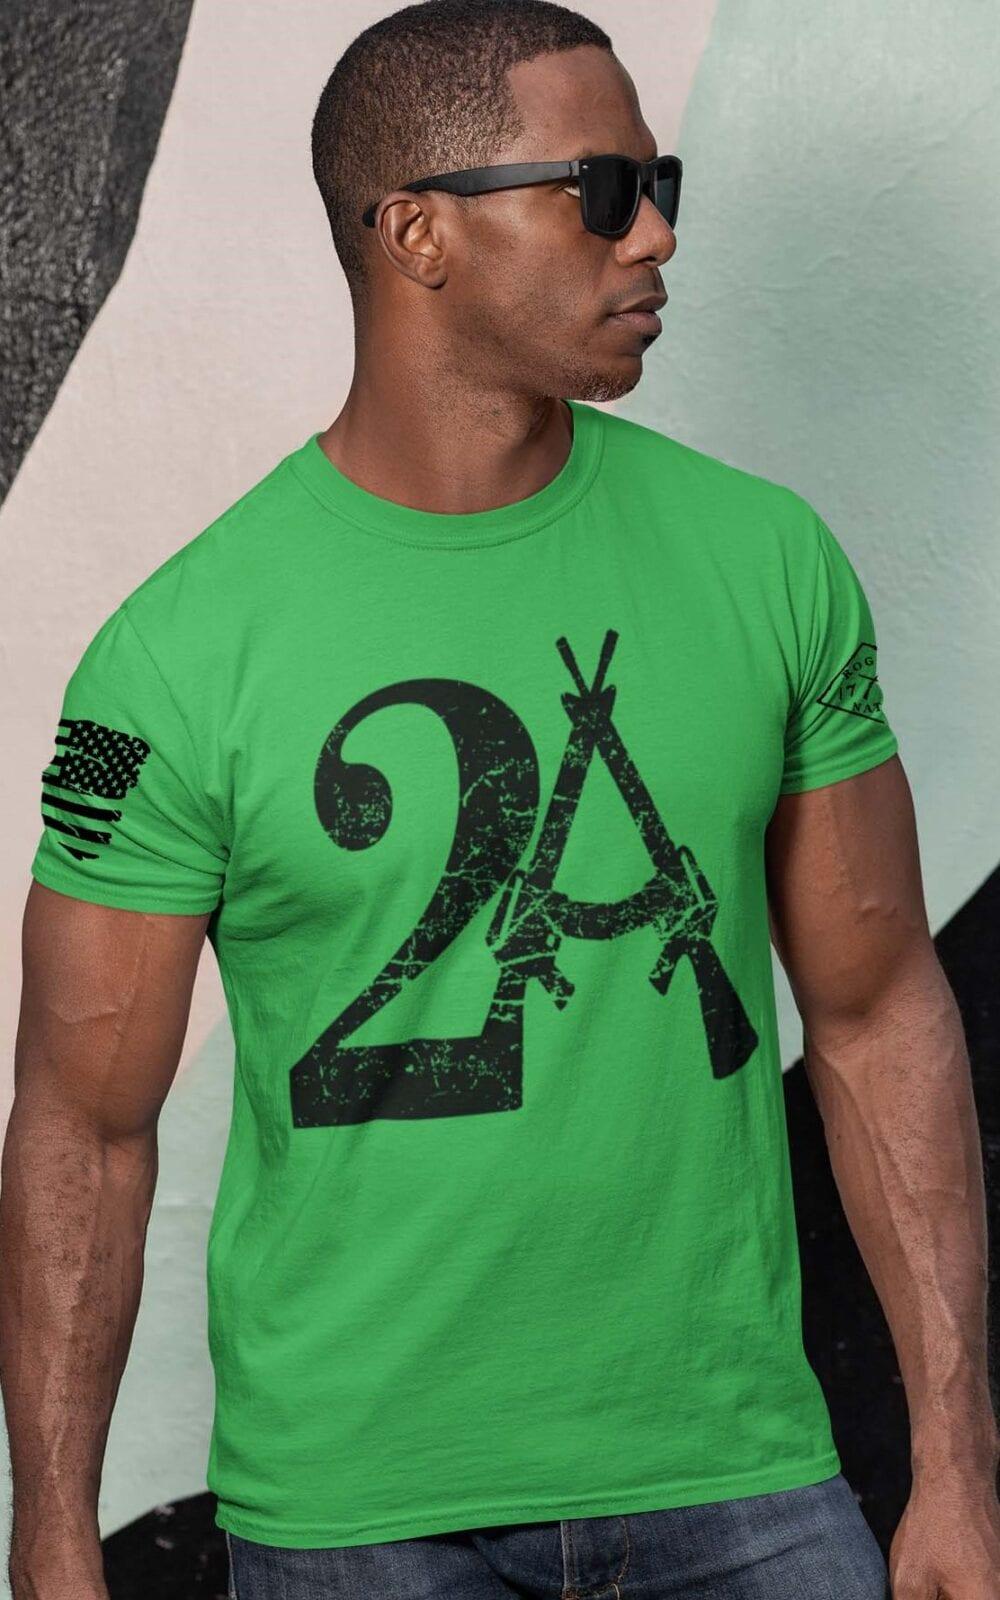 2A on Mens Green T-Shirt